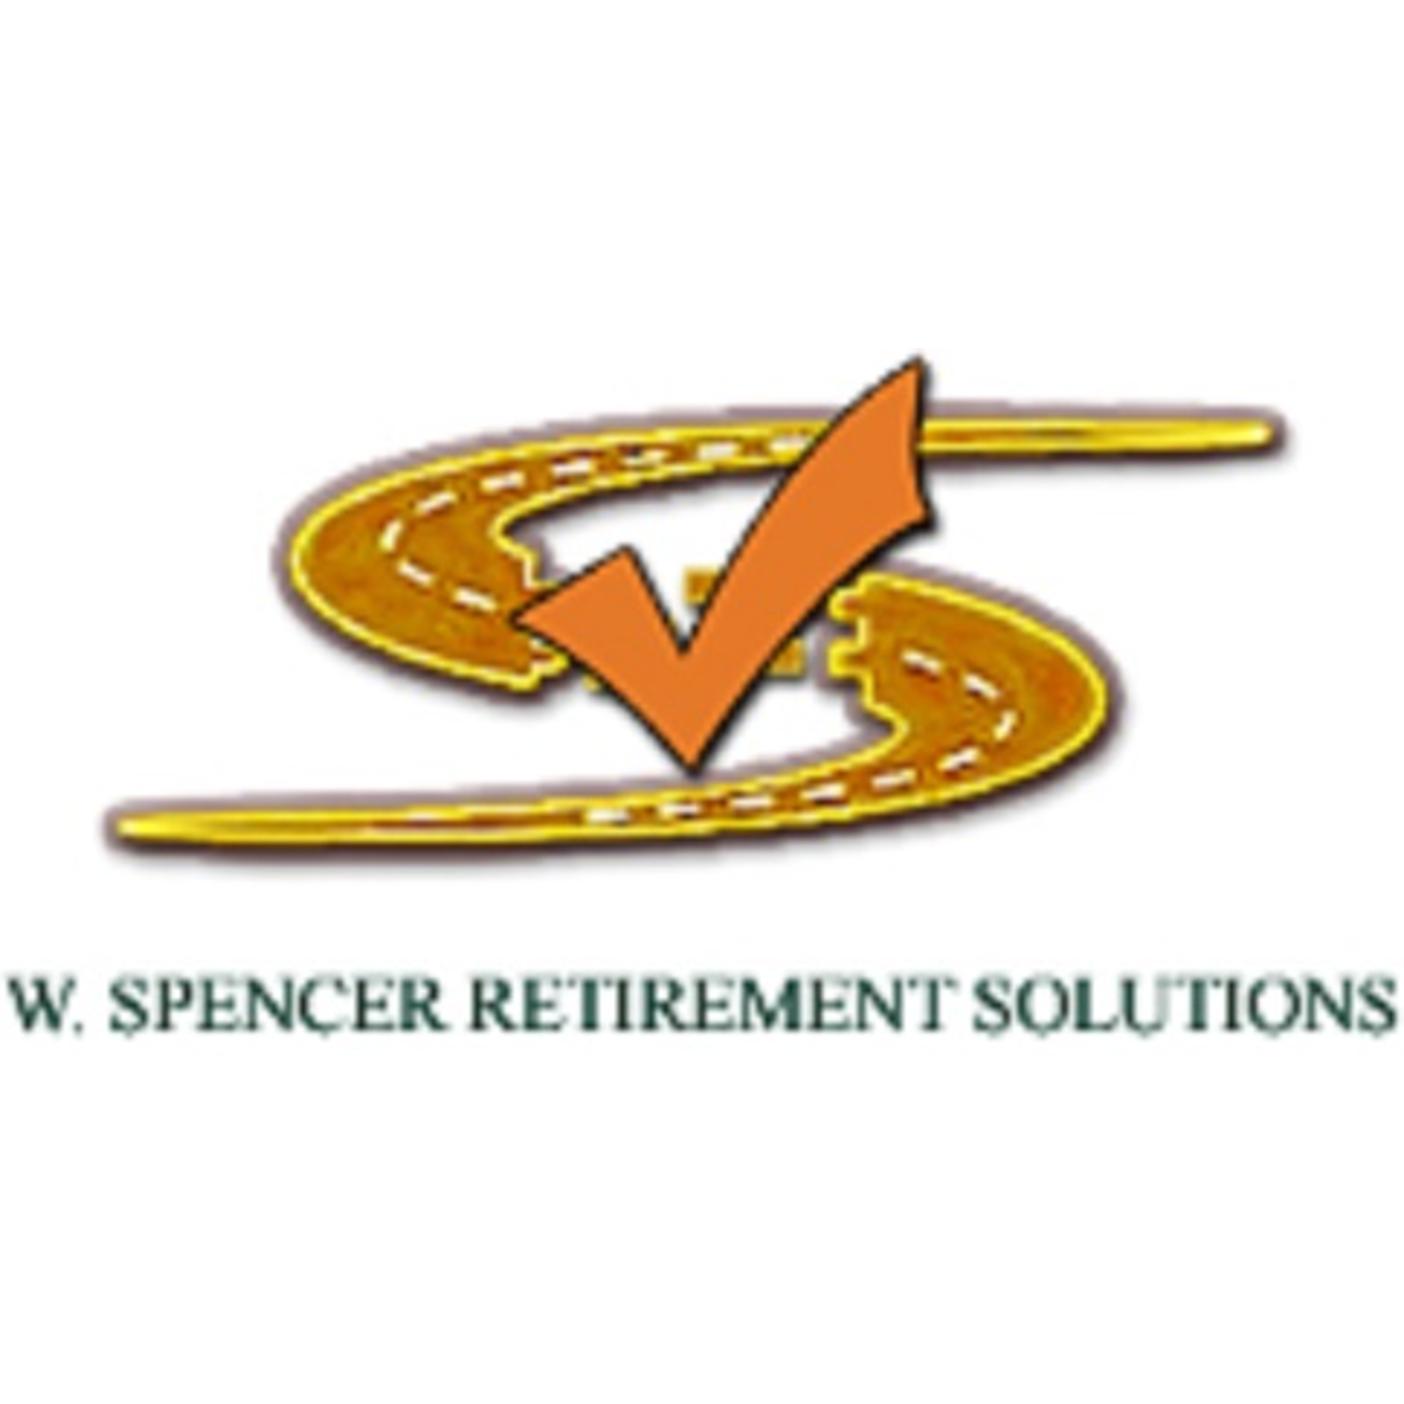 W. Spencer Retirement Solutions